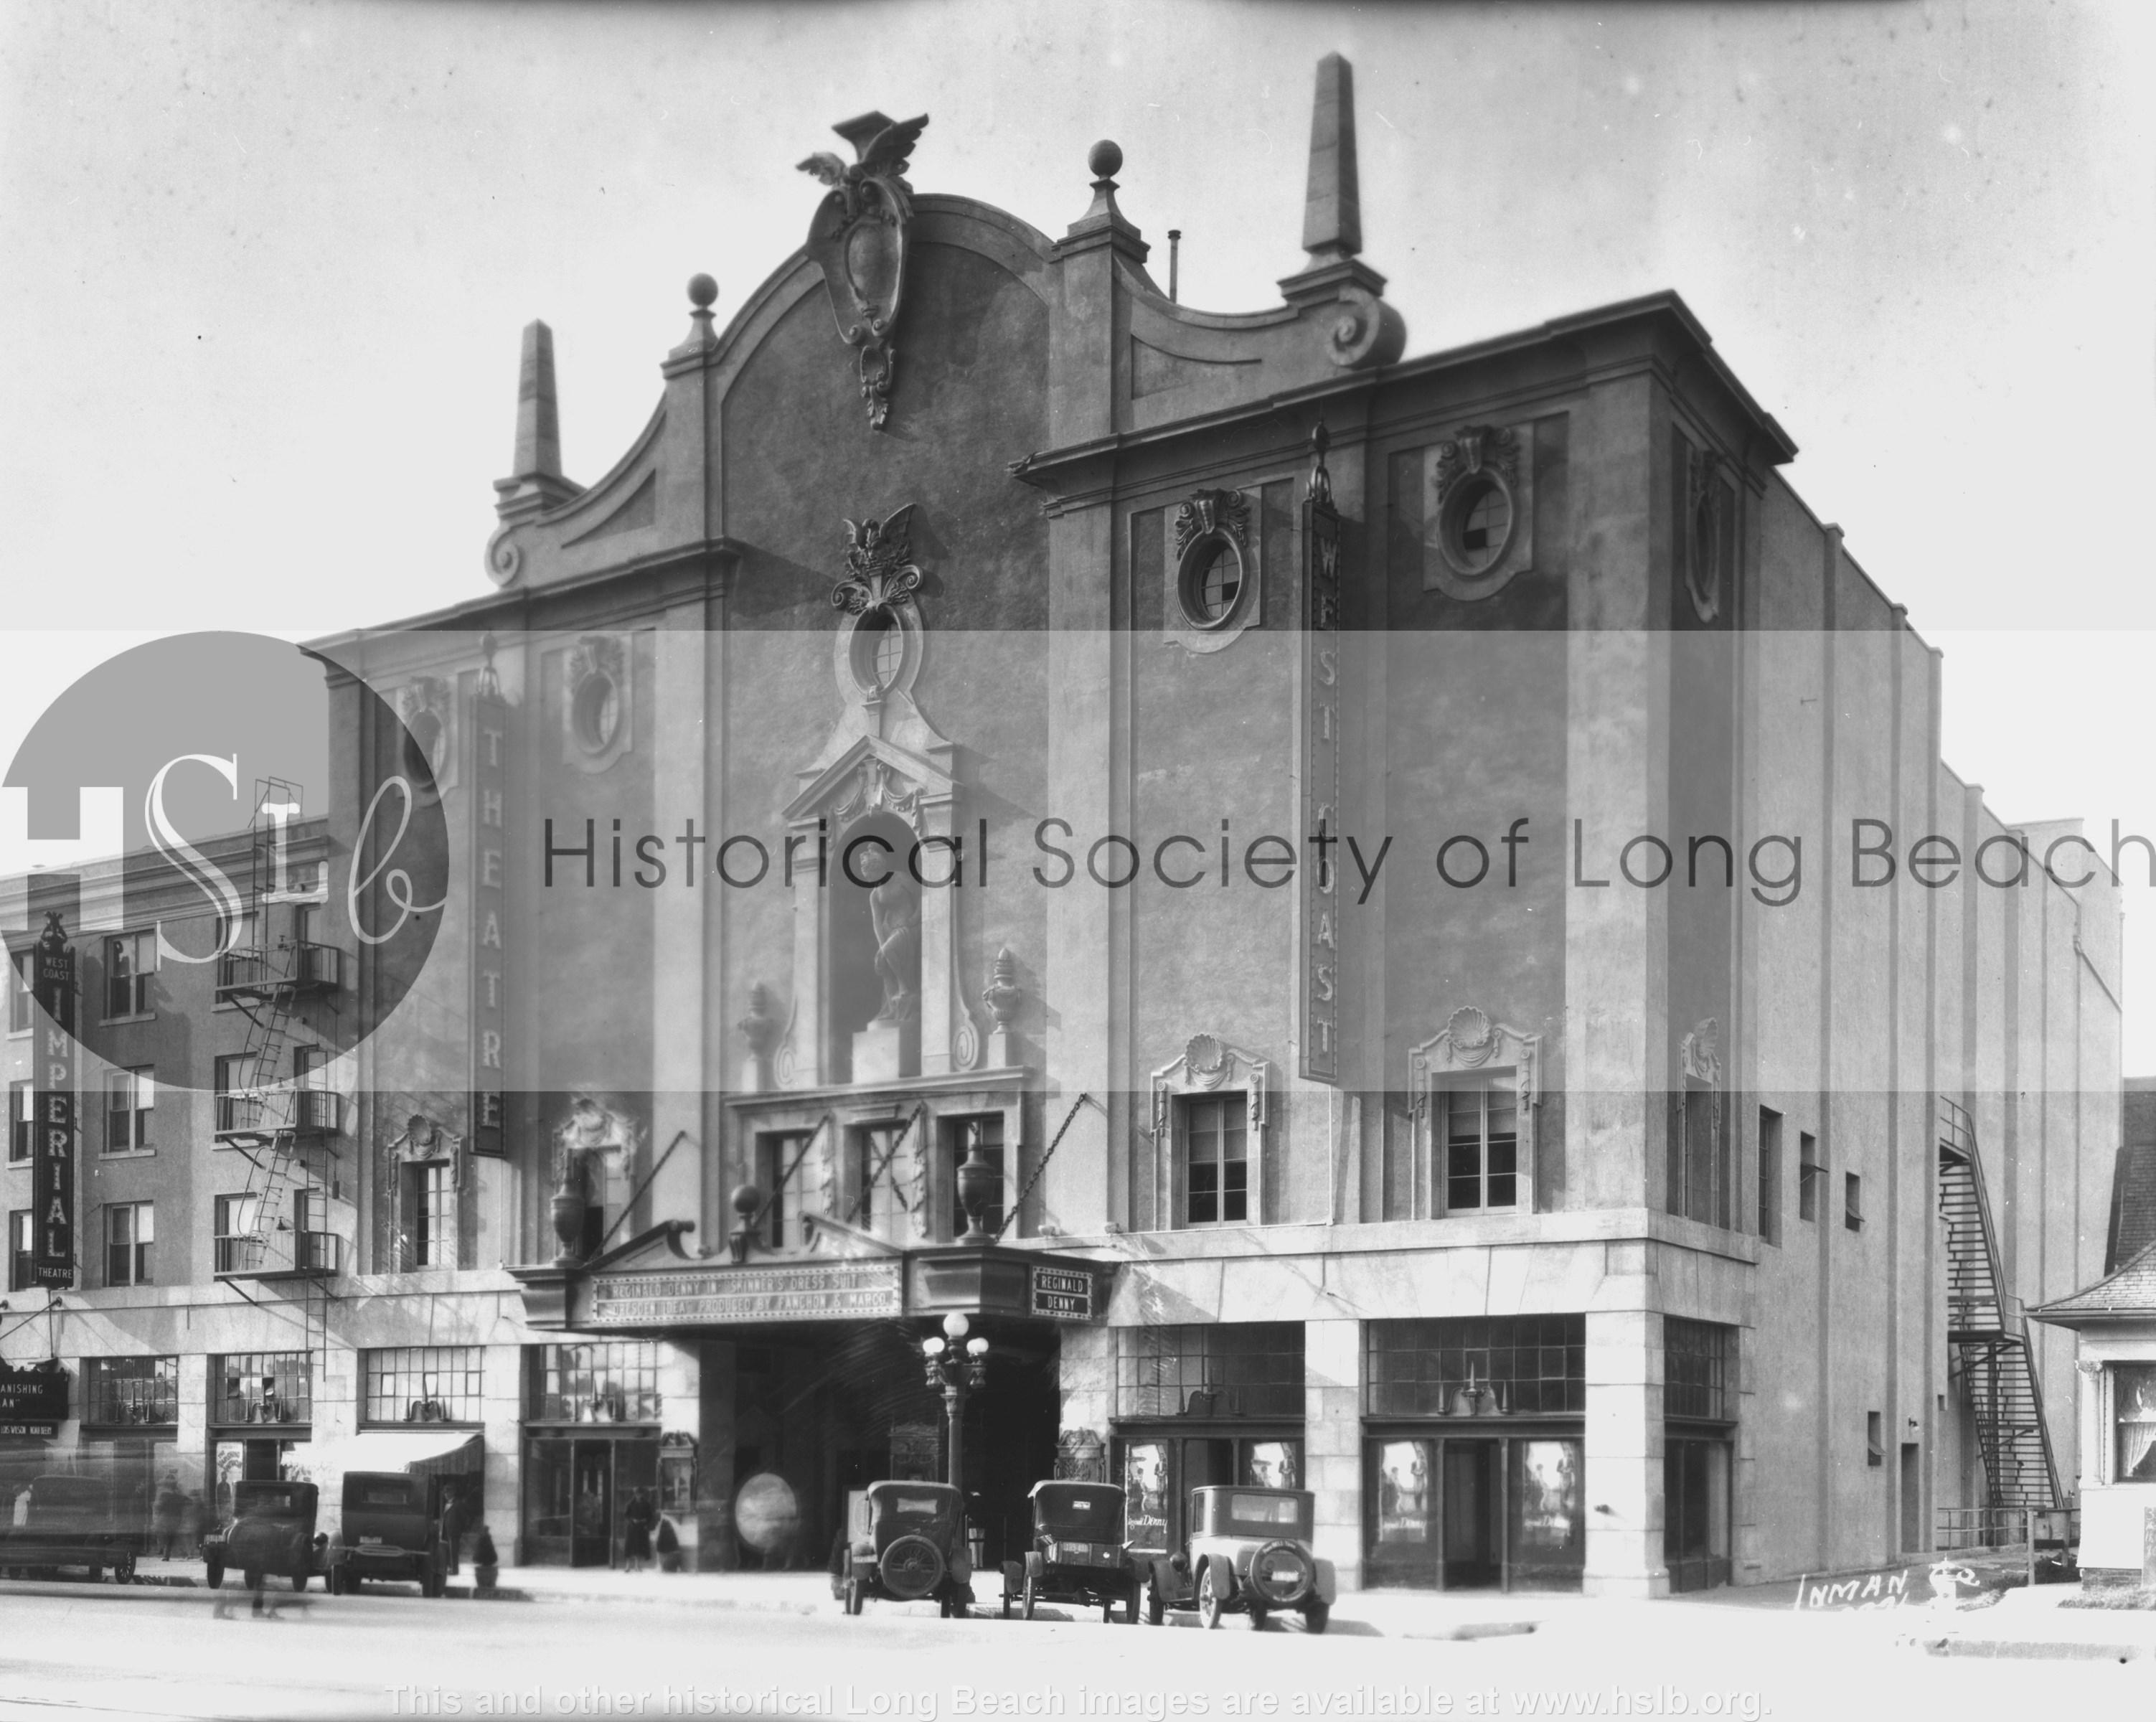 Fox West Coast Theatre, 1927